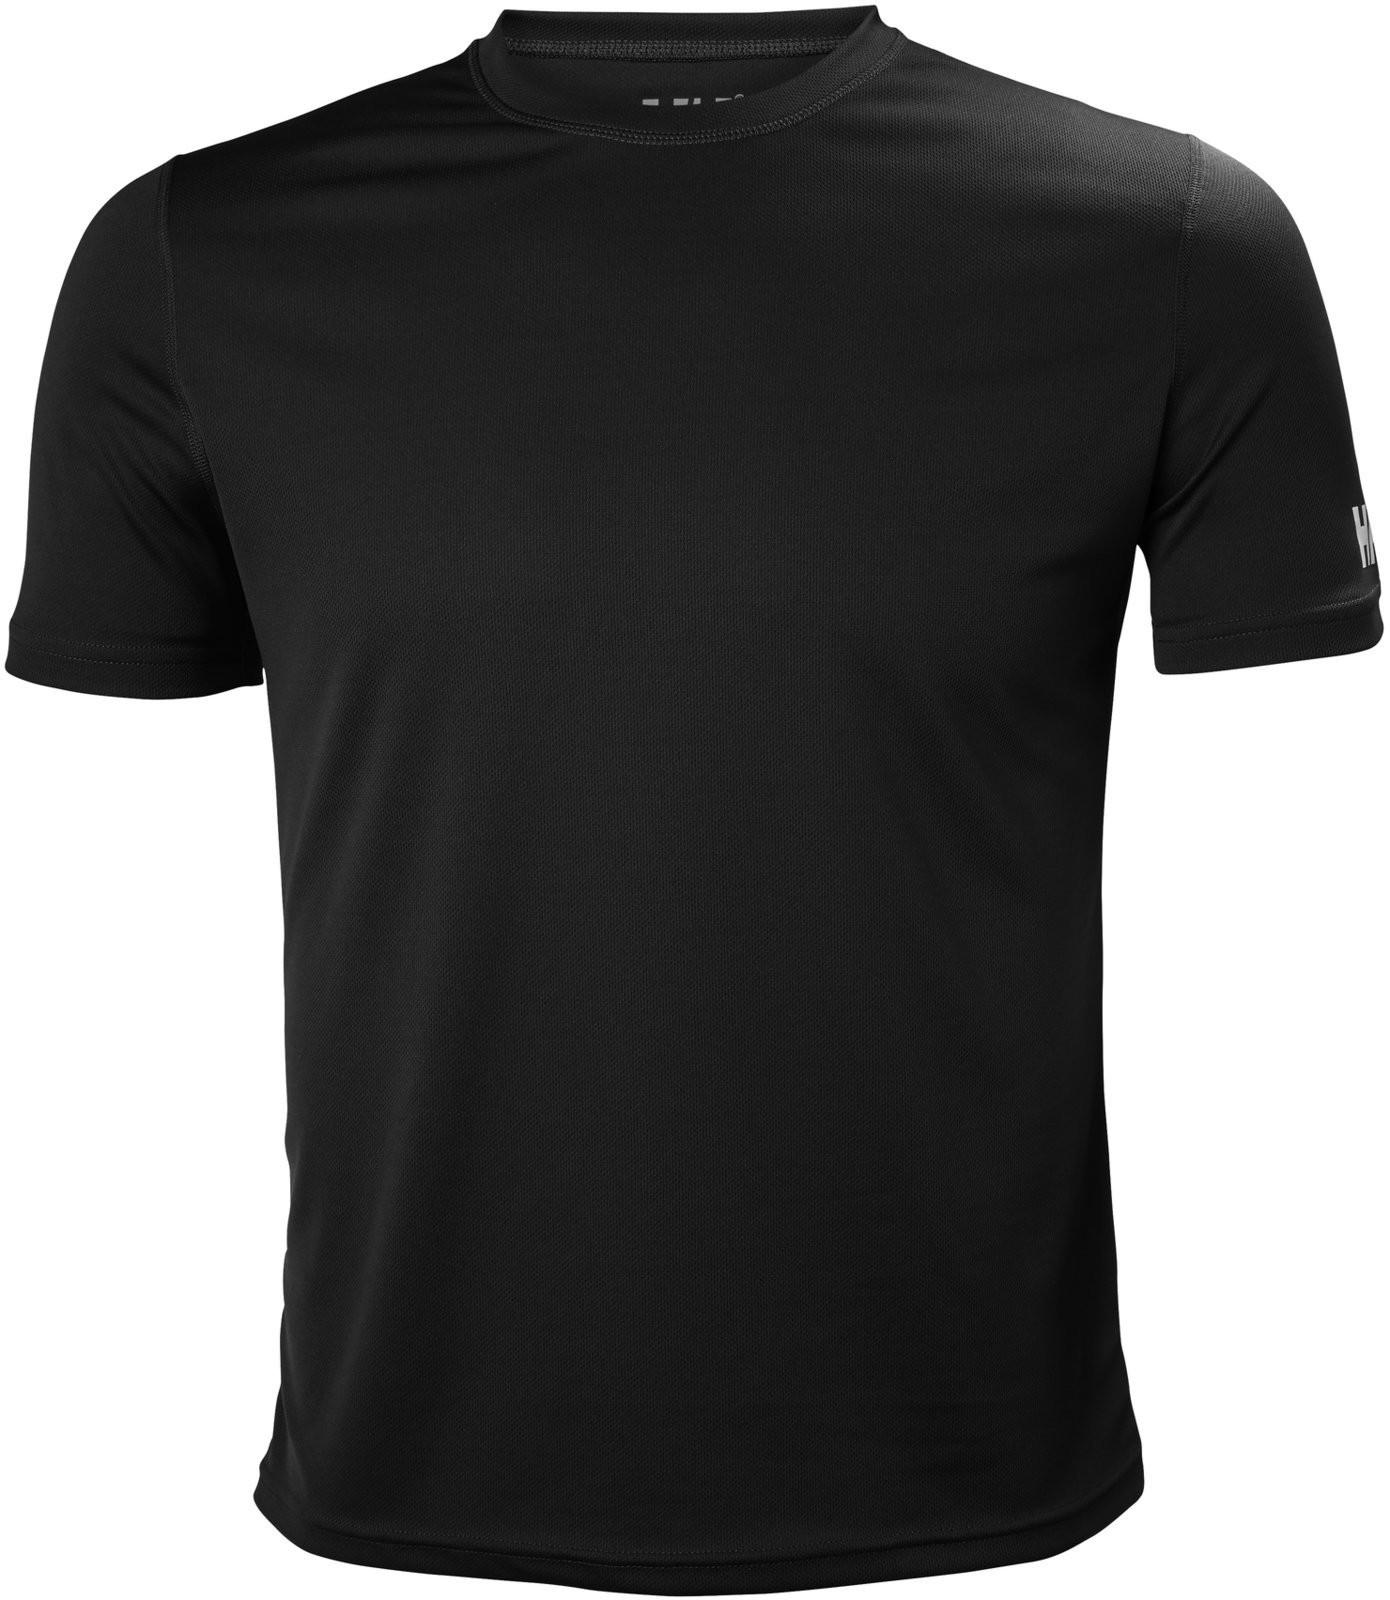 Helly Hansen HH Tech T-Shirt Ebony - M